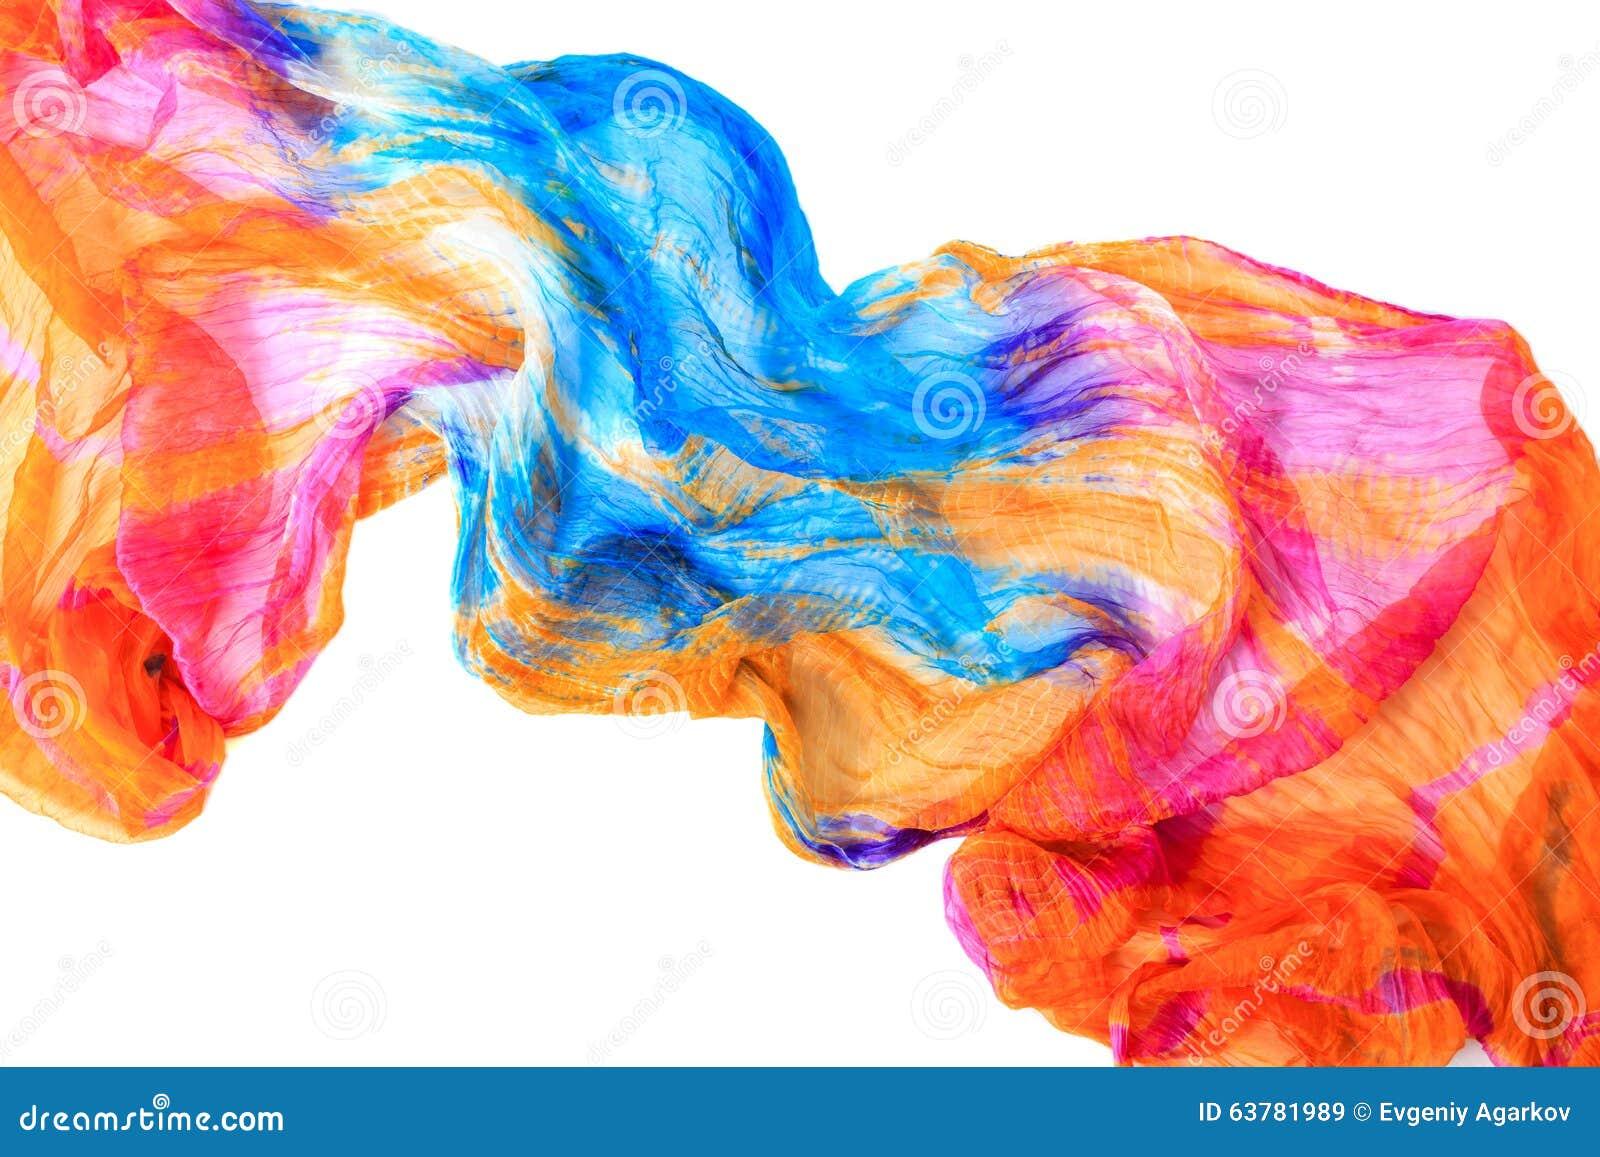 Tissu Drape Elegant Fond Orange Et Bleu De Texture De Tissu Image